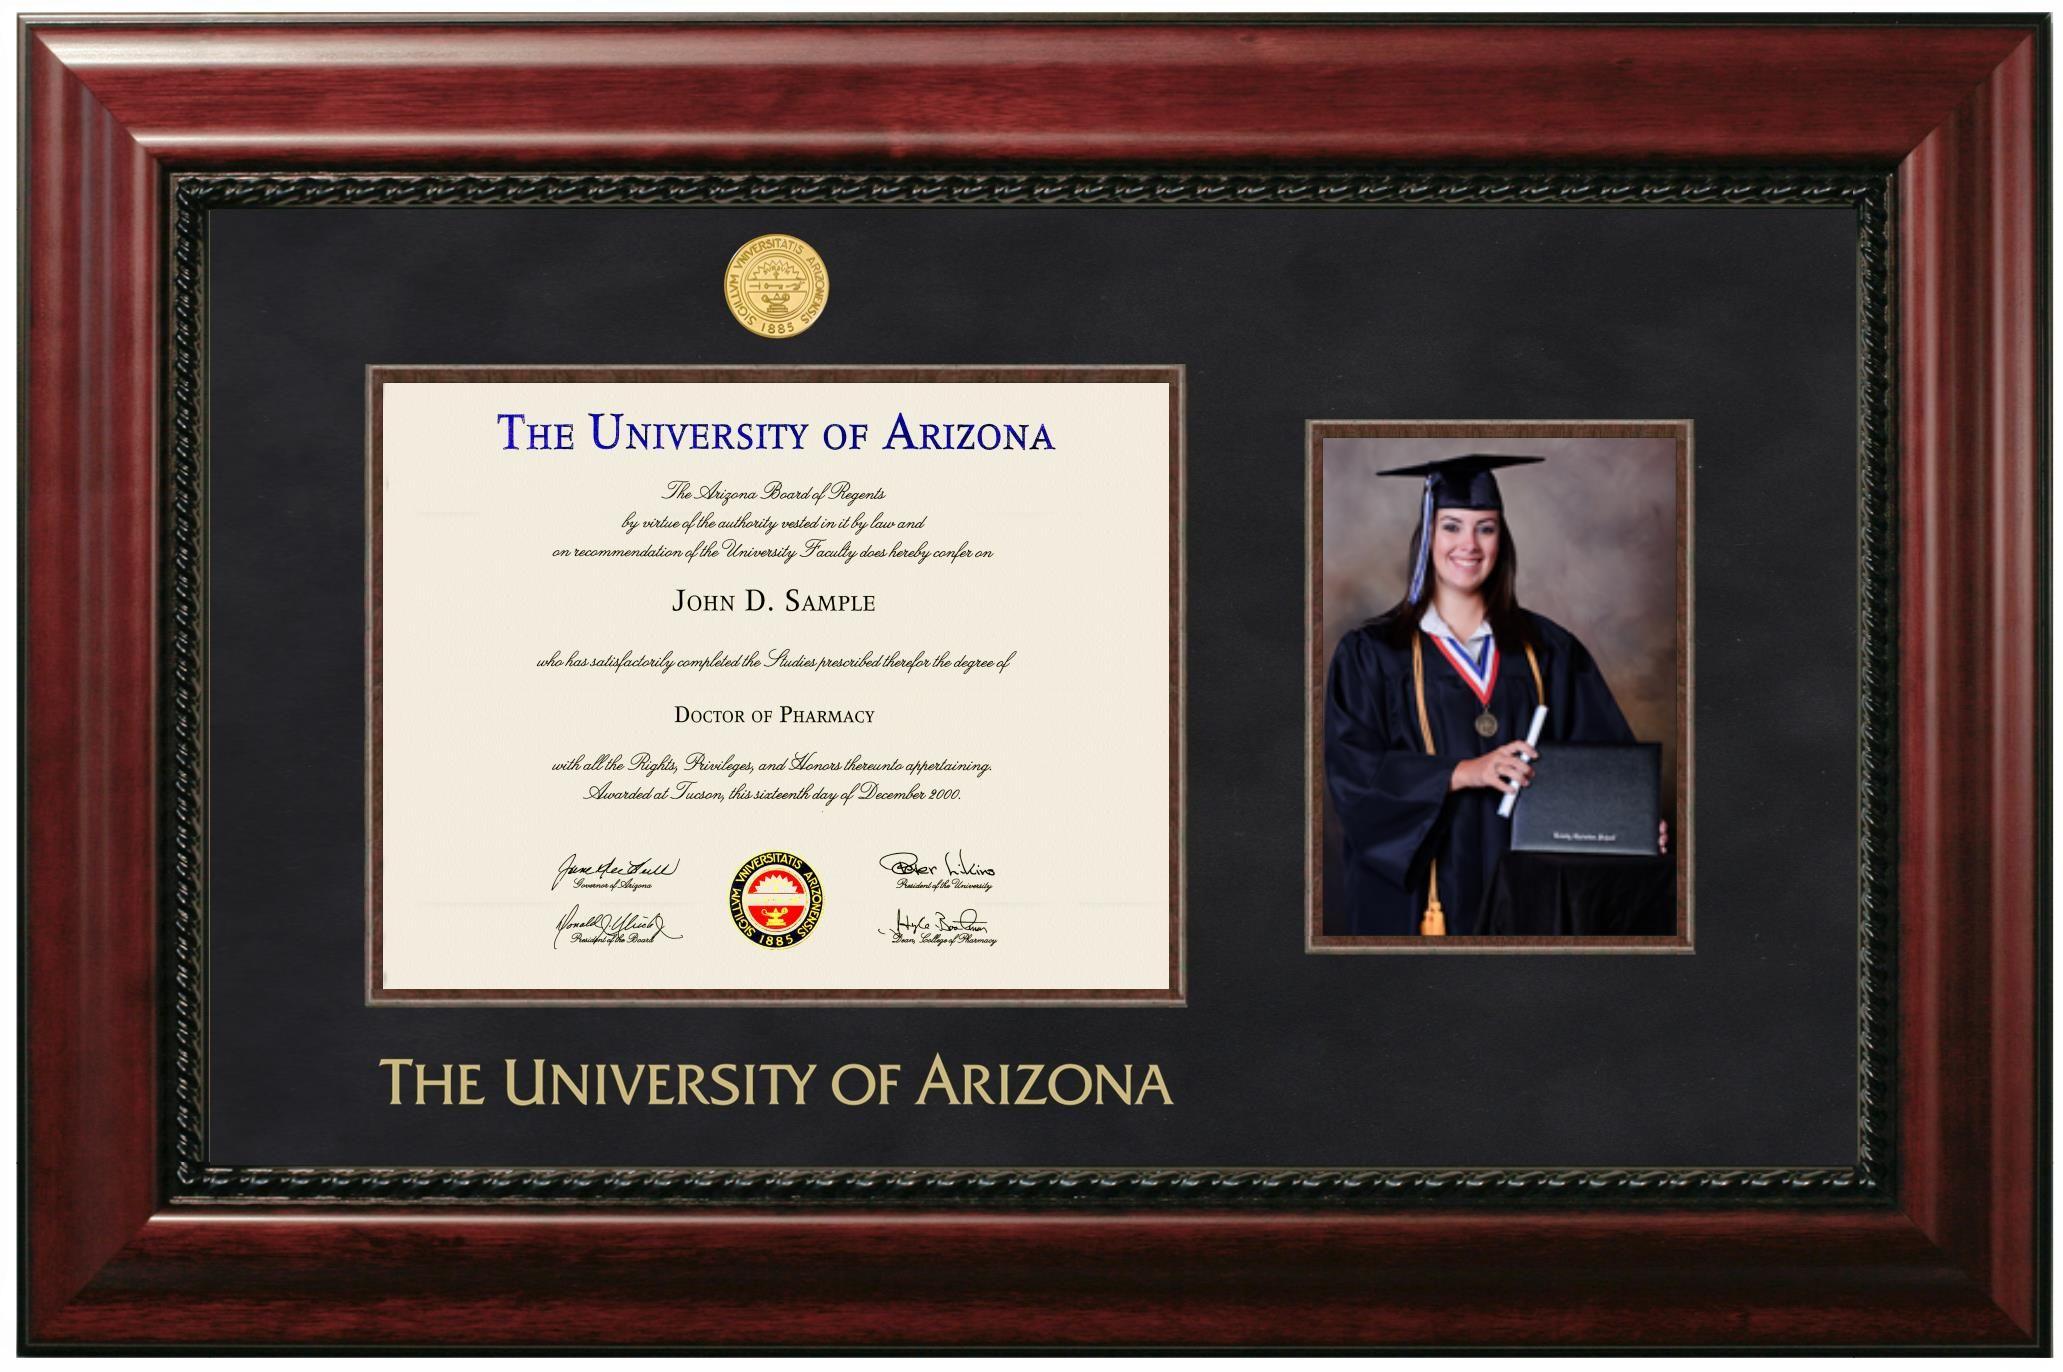 Price 228 00 University Of Arizona Diploma Frame With 5 X 7 Portrait Diploma Frame University Of Arizona Graduation Frame